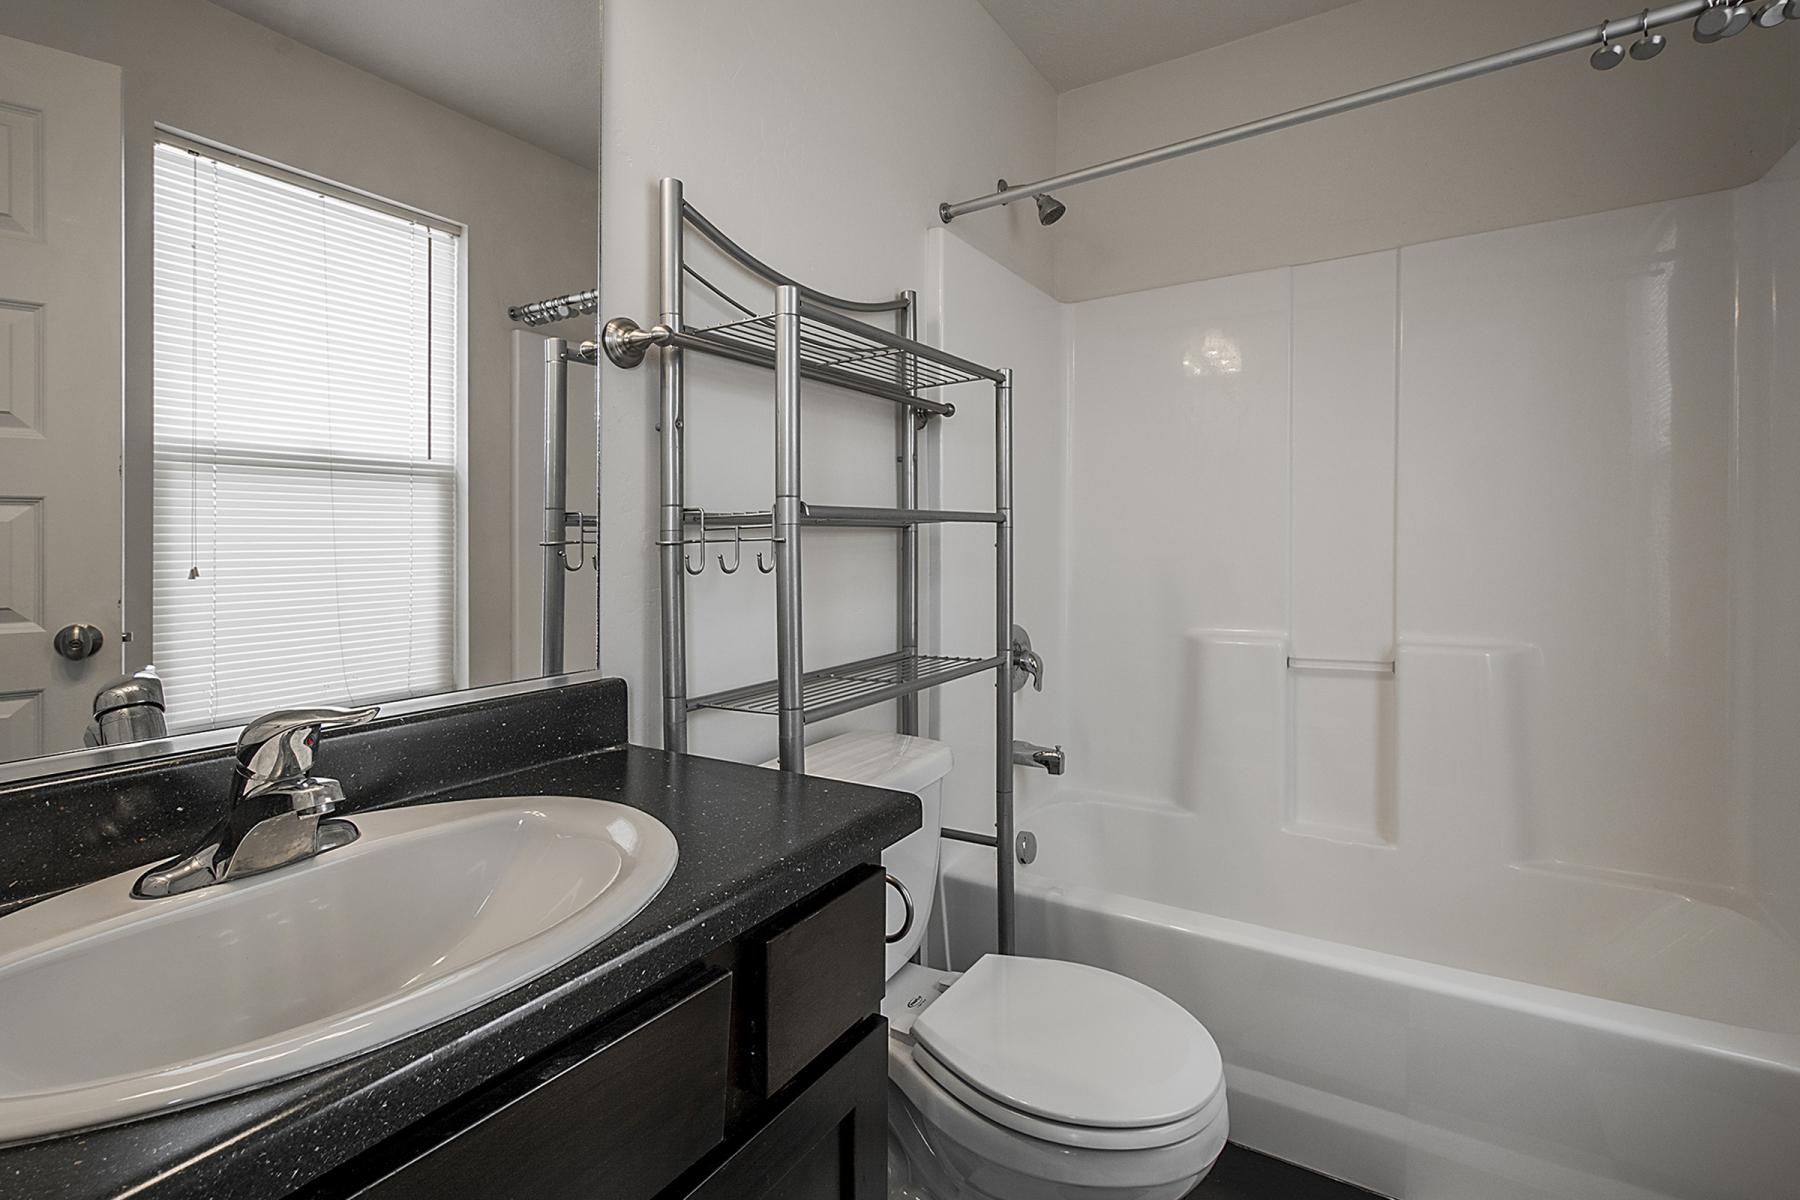 BathroomTwo_1800x1200_2515436